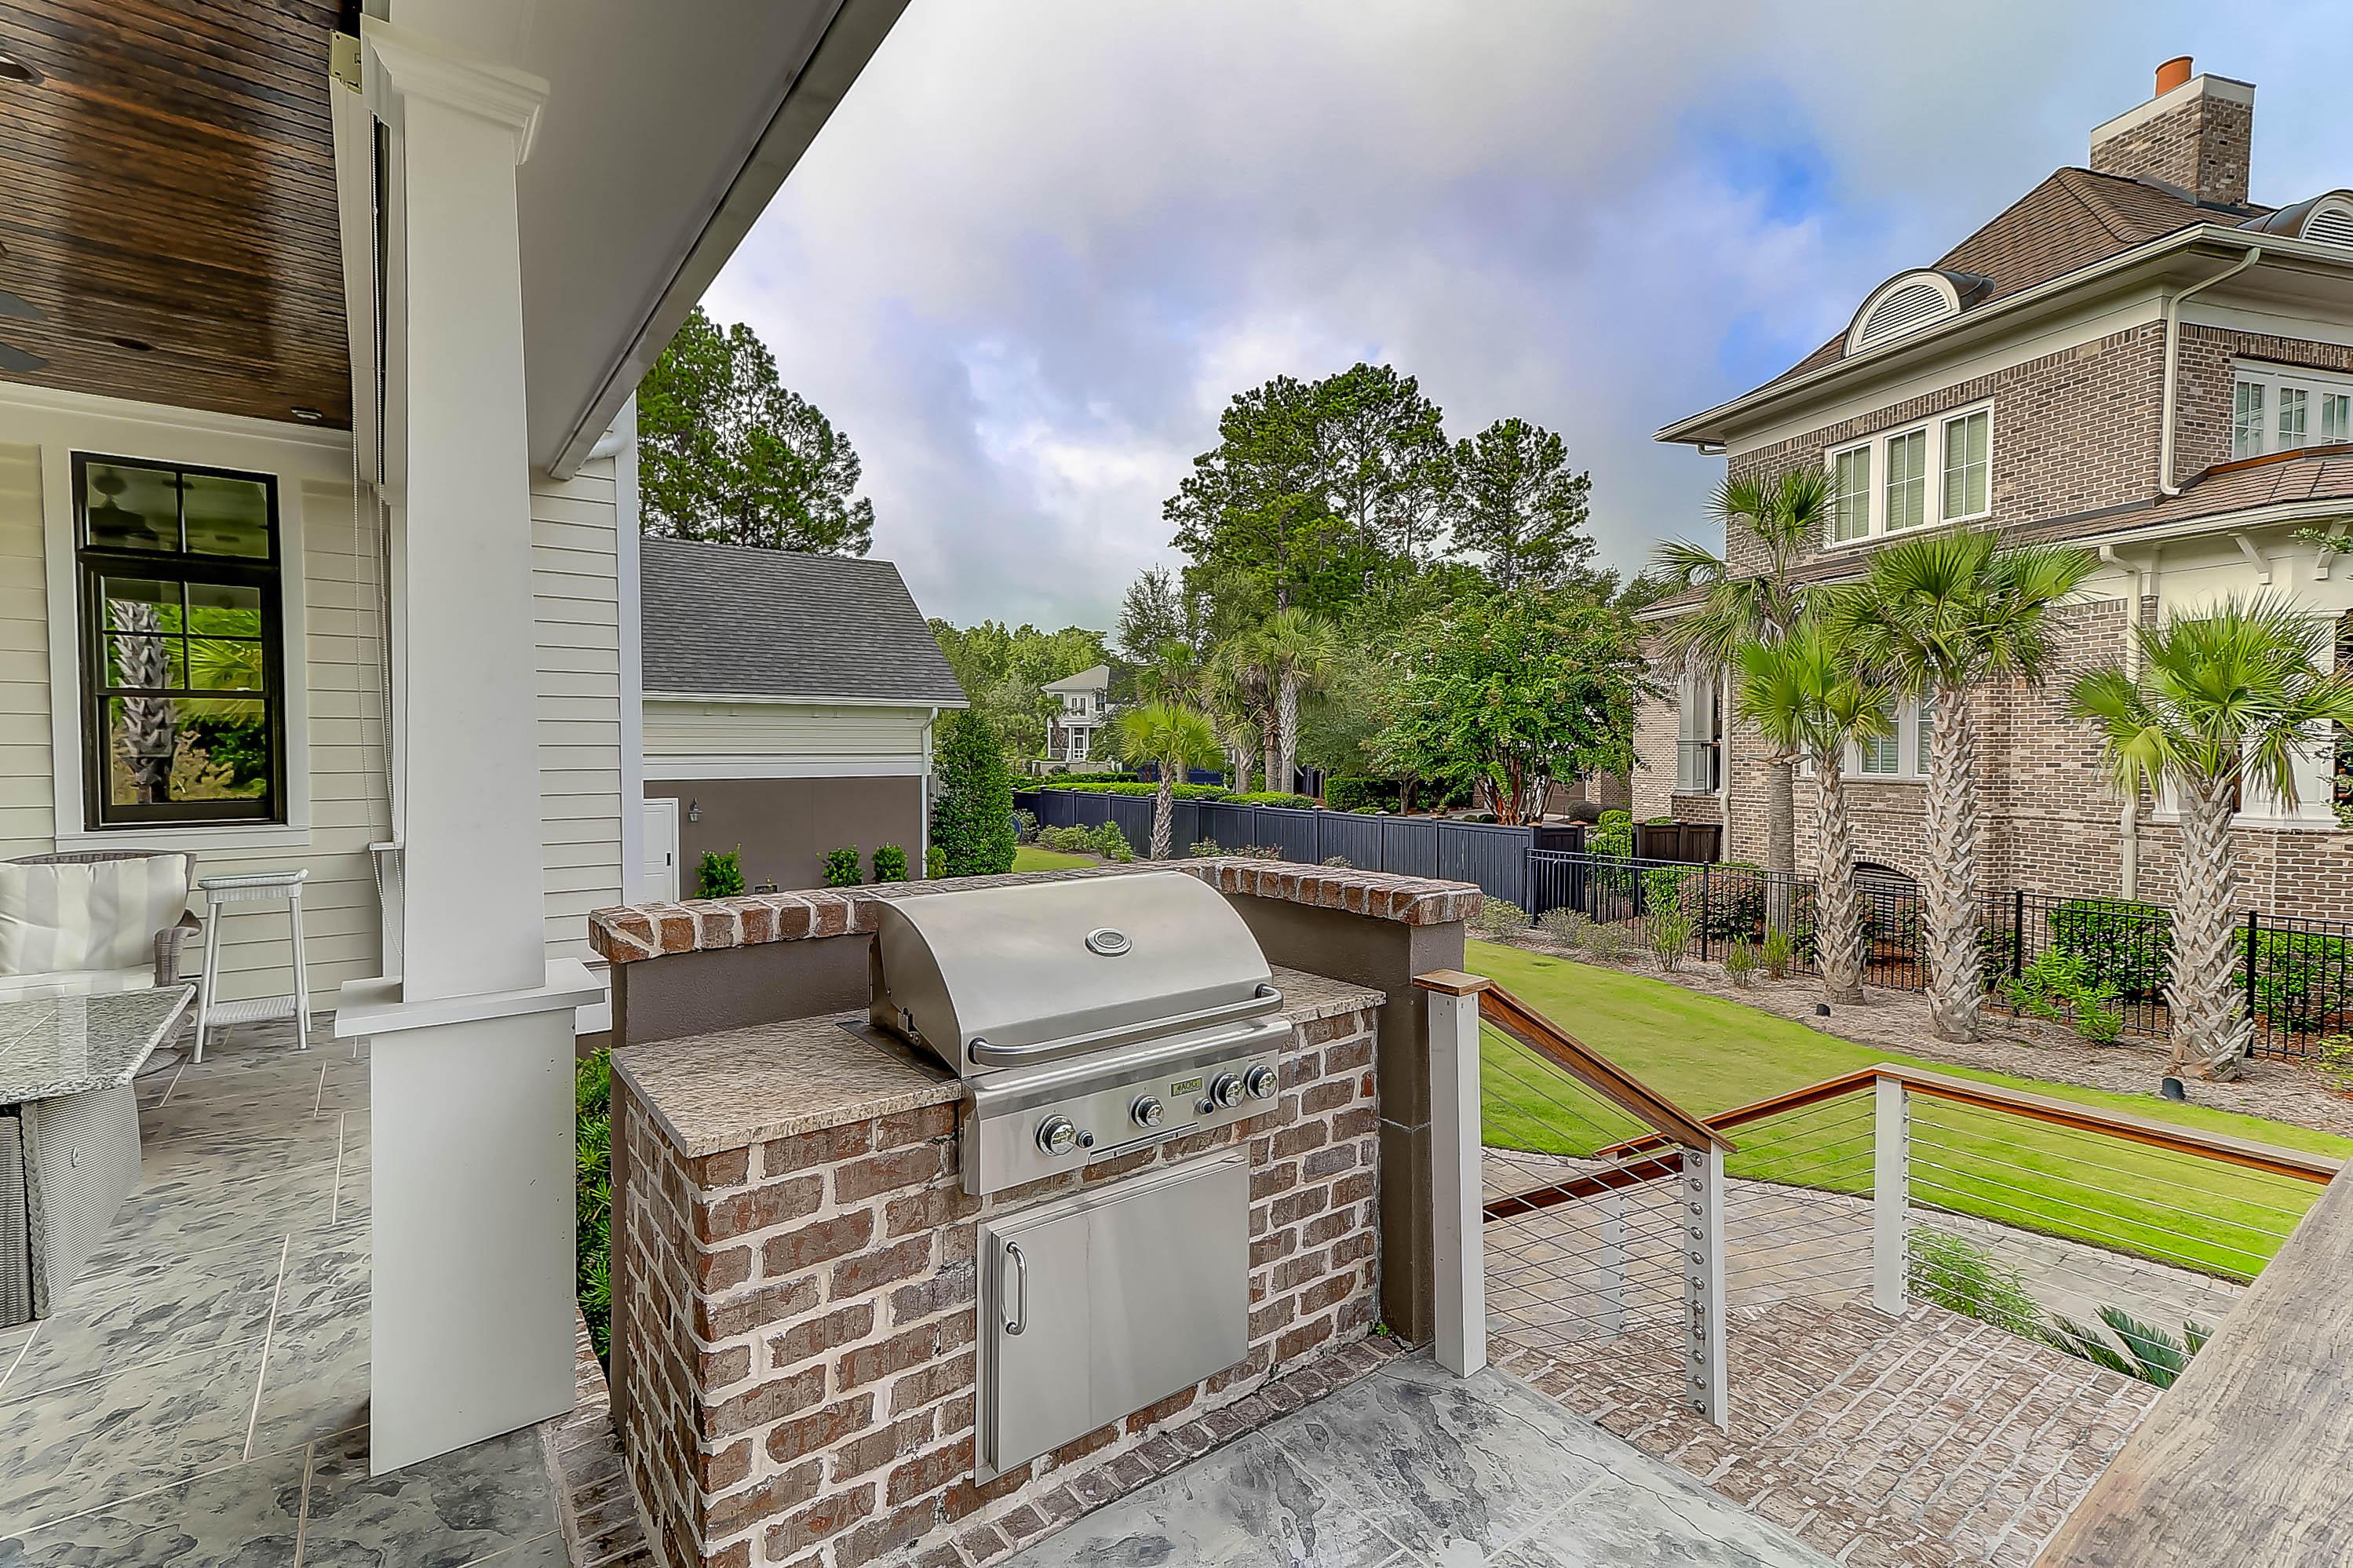 Photo of 369 Ralston Creek St, Charleston, SC 29492